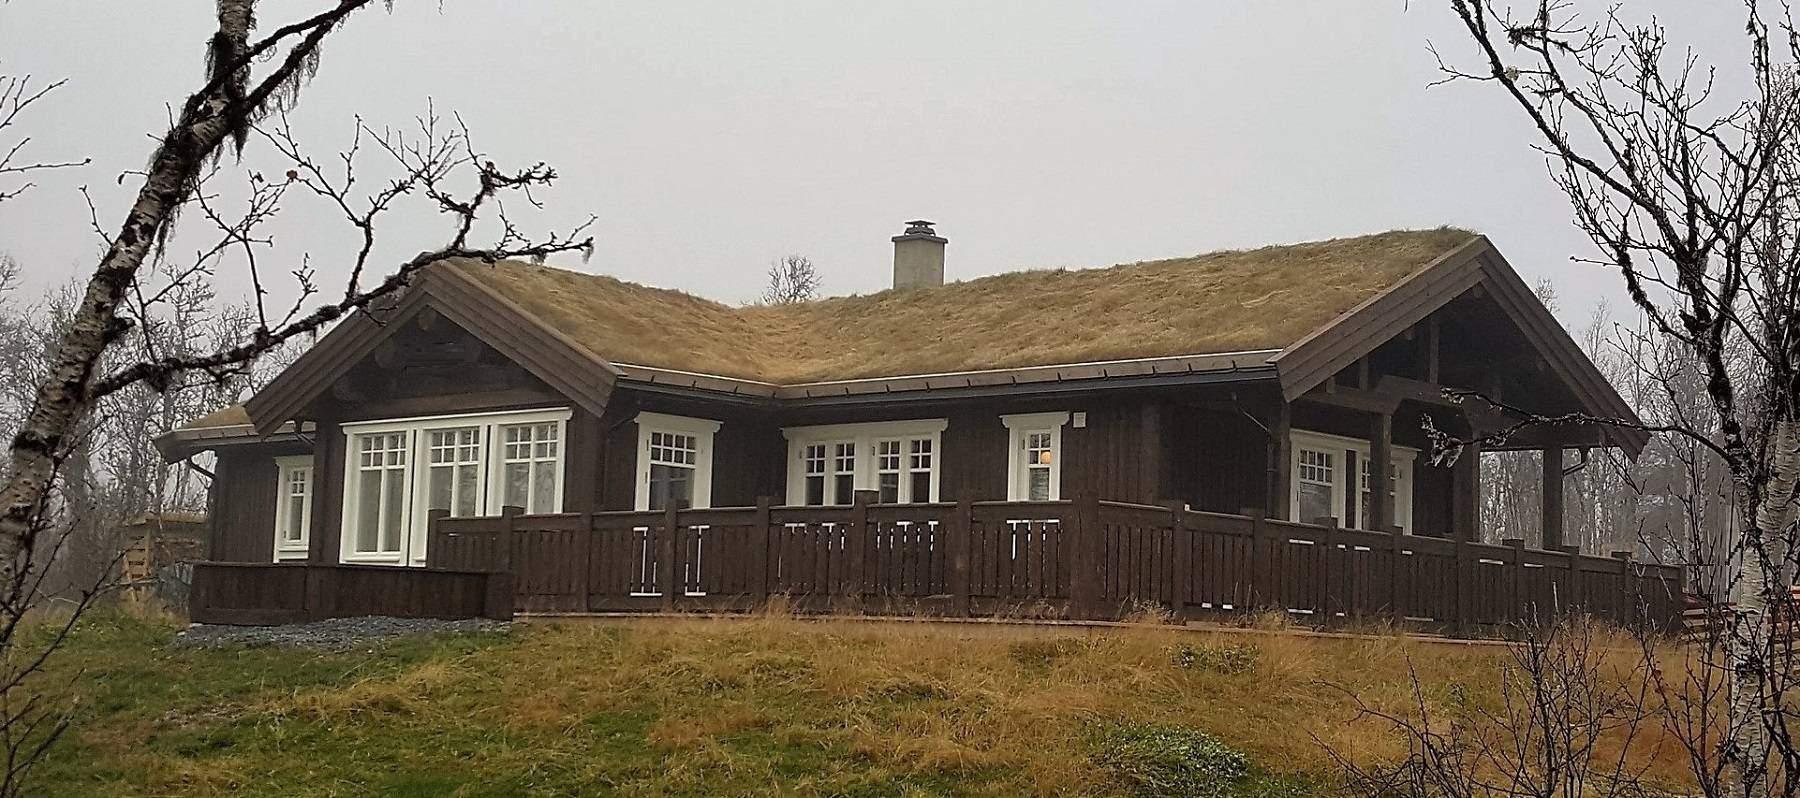 04 Vaset Snøtind113 167 04